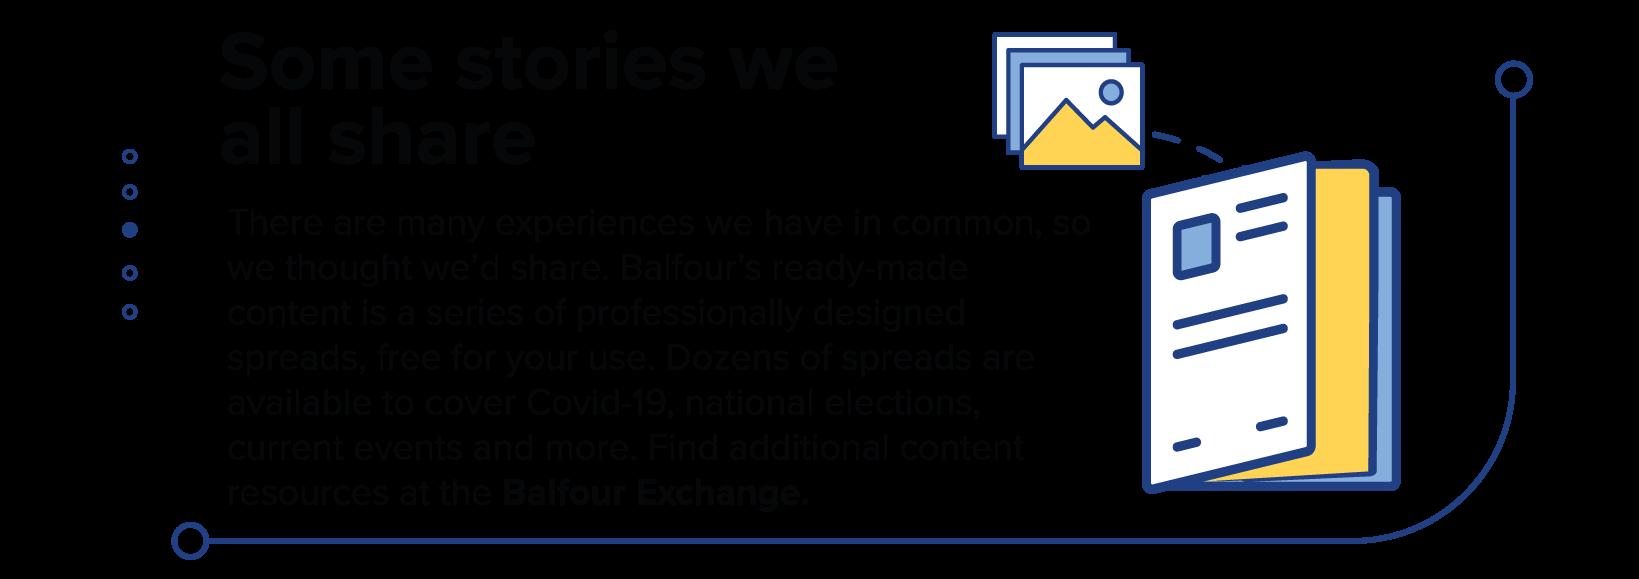 BalfourSolutions-04